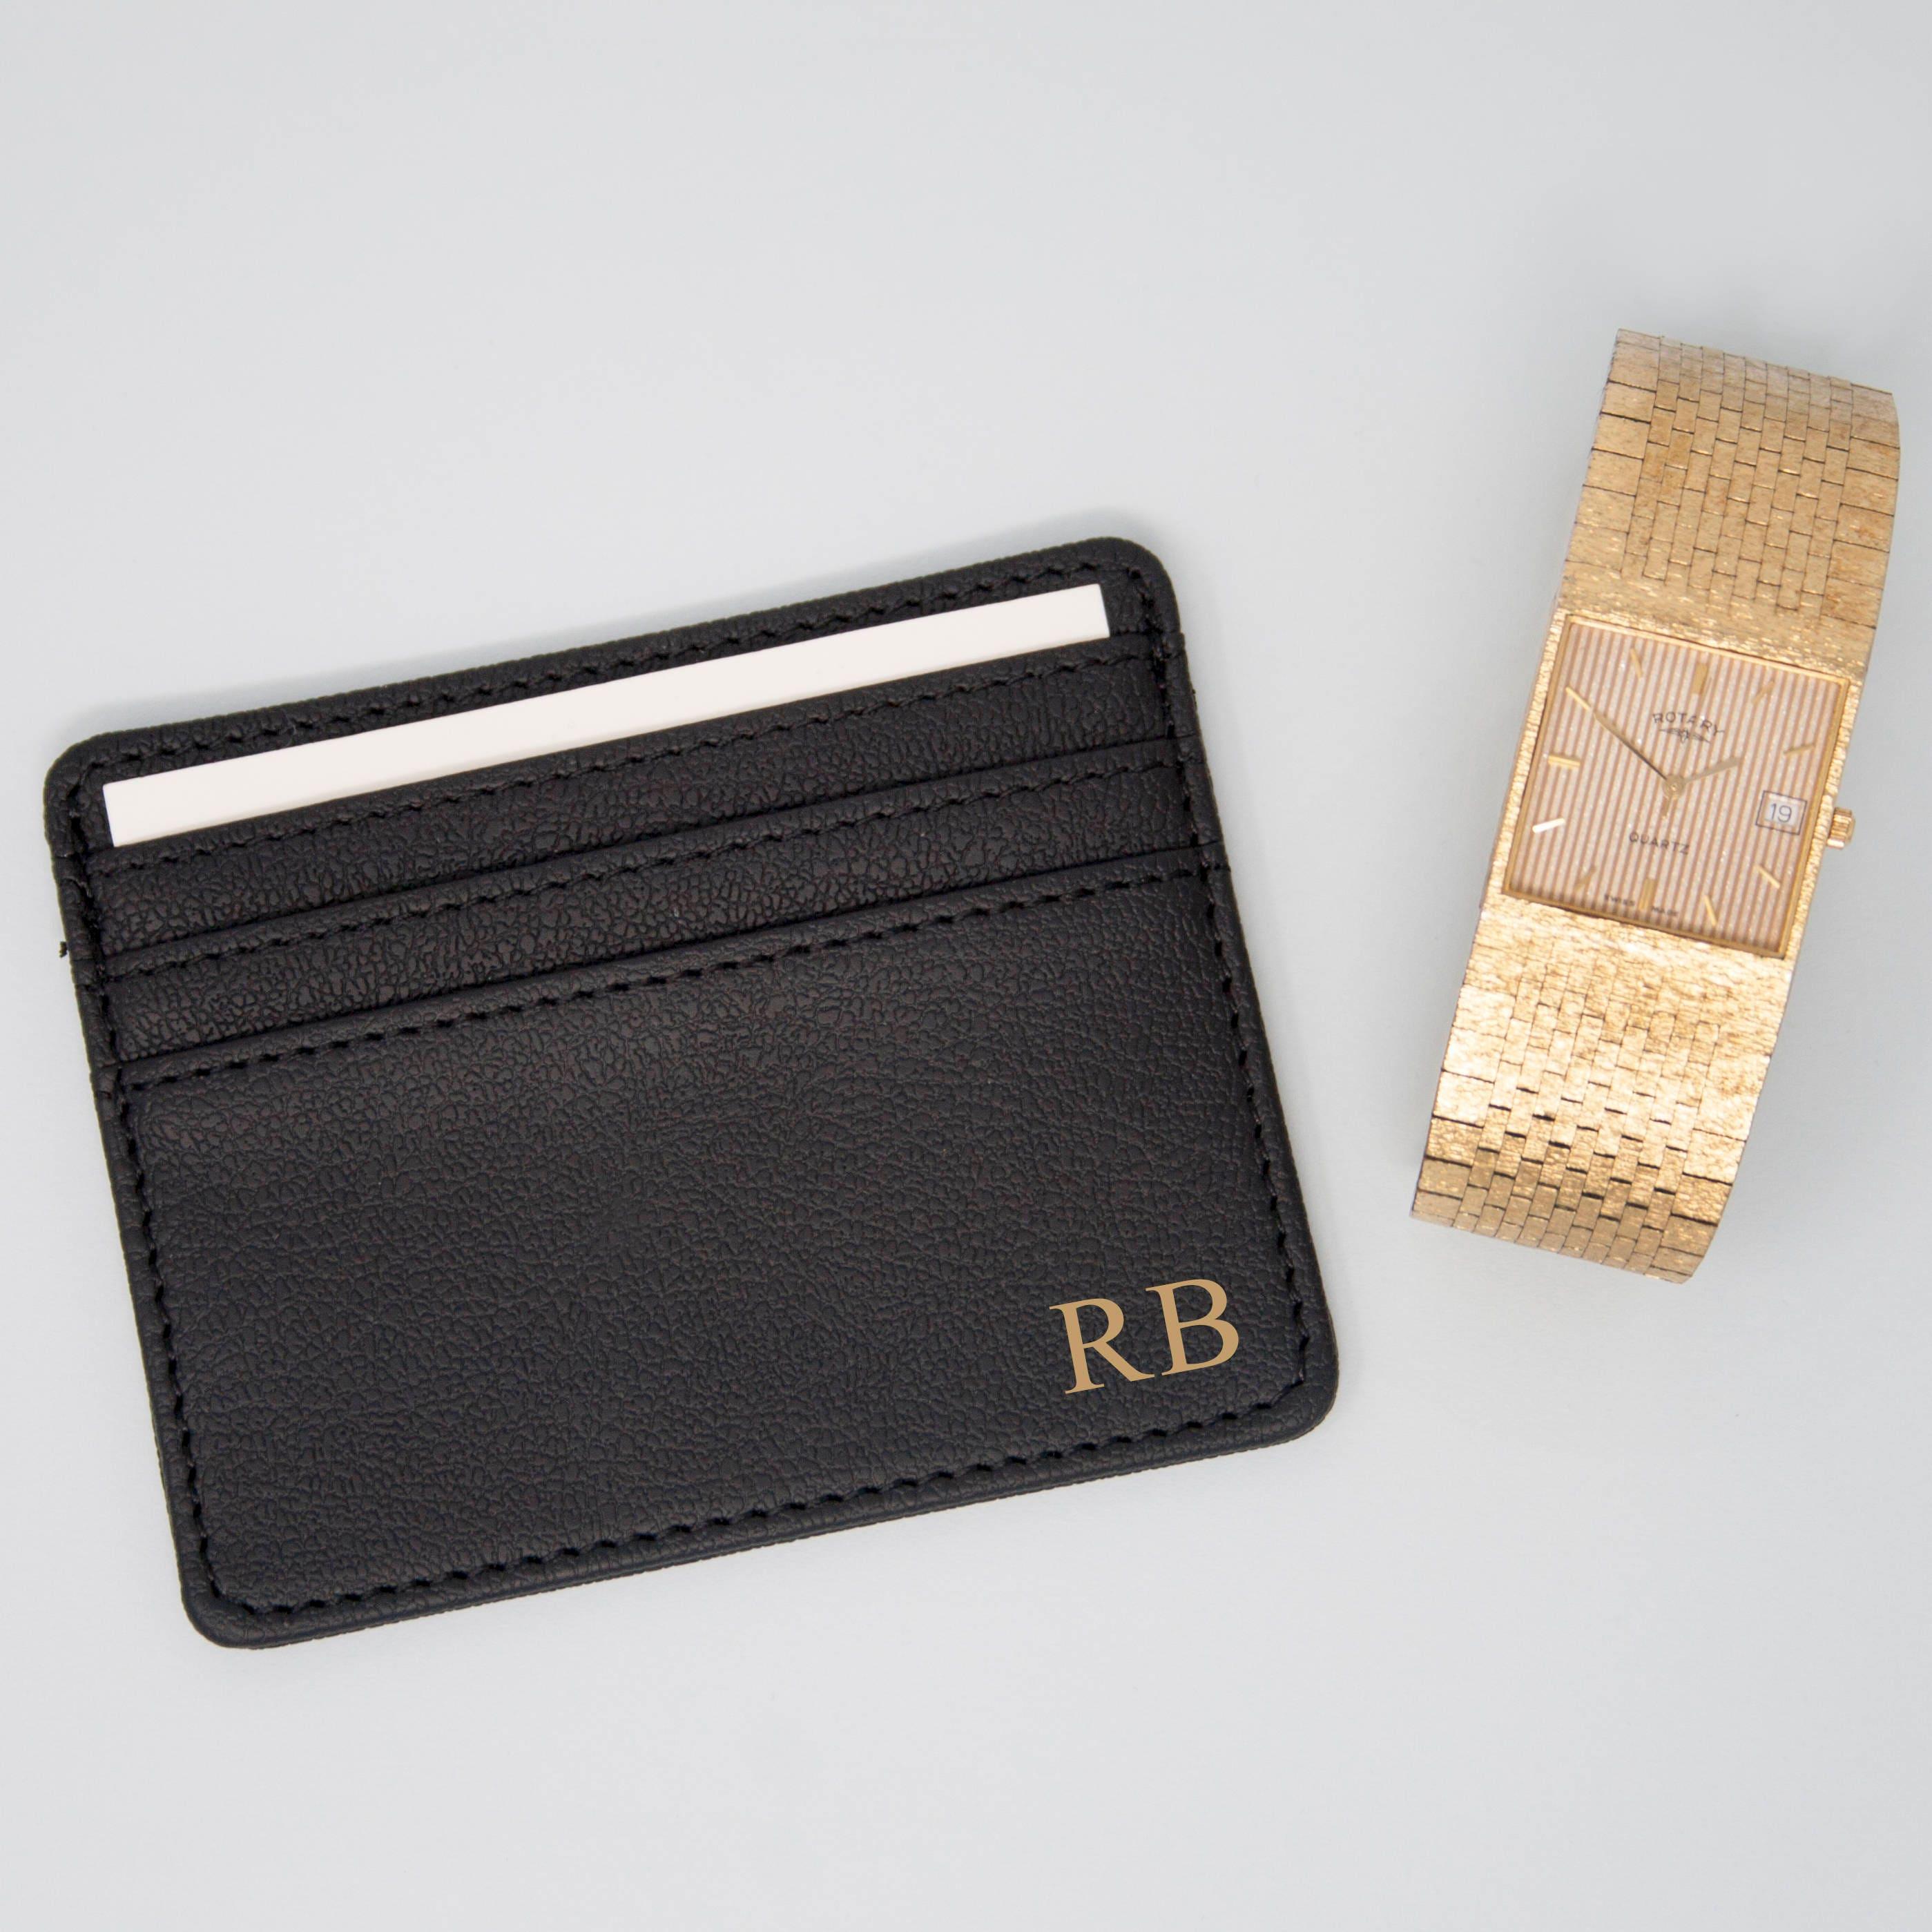 size 40 6ccc6 a7e9d Men's Monogram Card Holder, Men's Initial Credit Card Wallet, Men's Travel  Wallet Holder, Groomsmen Gifts, Valentine's Gifts for him